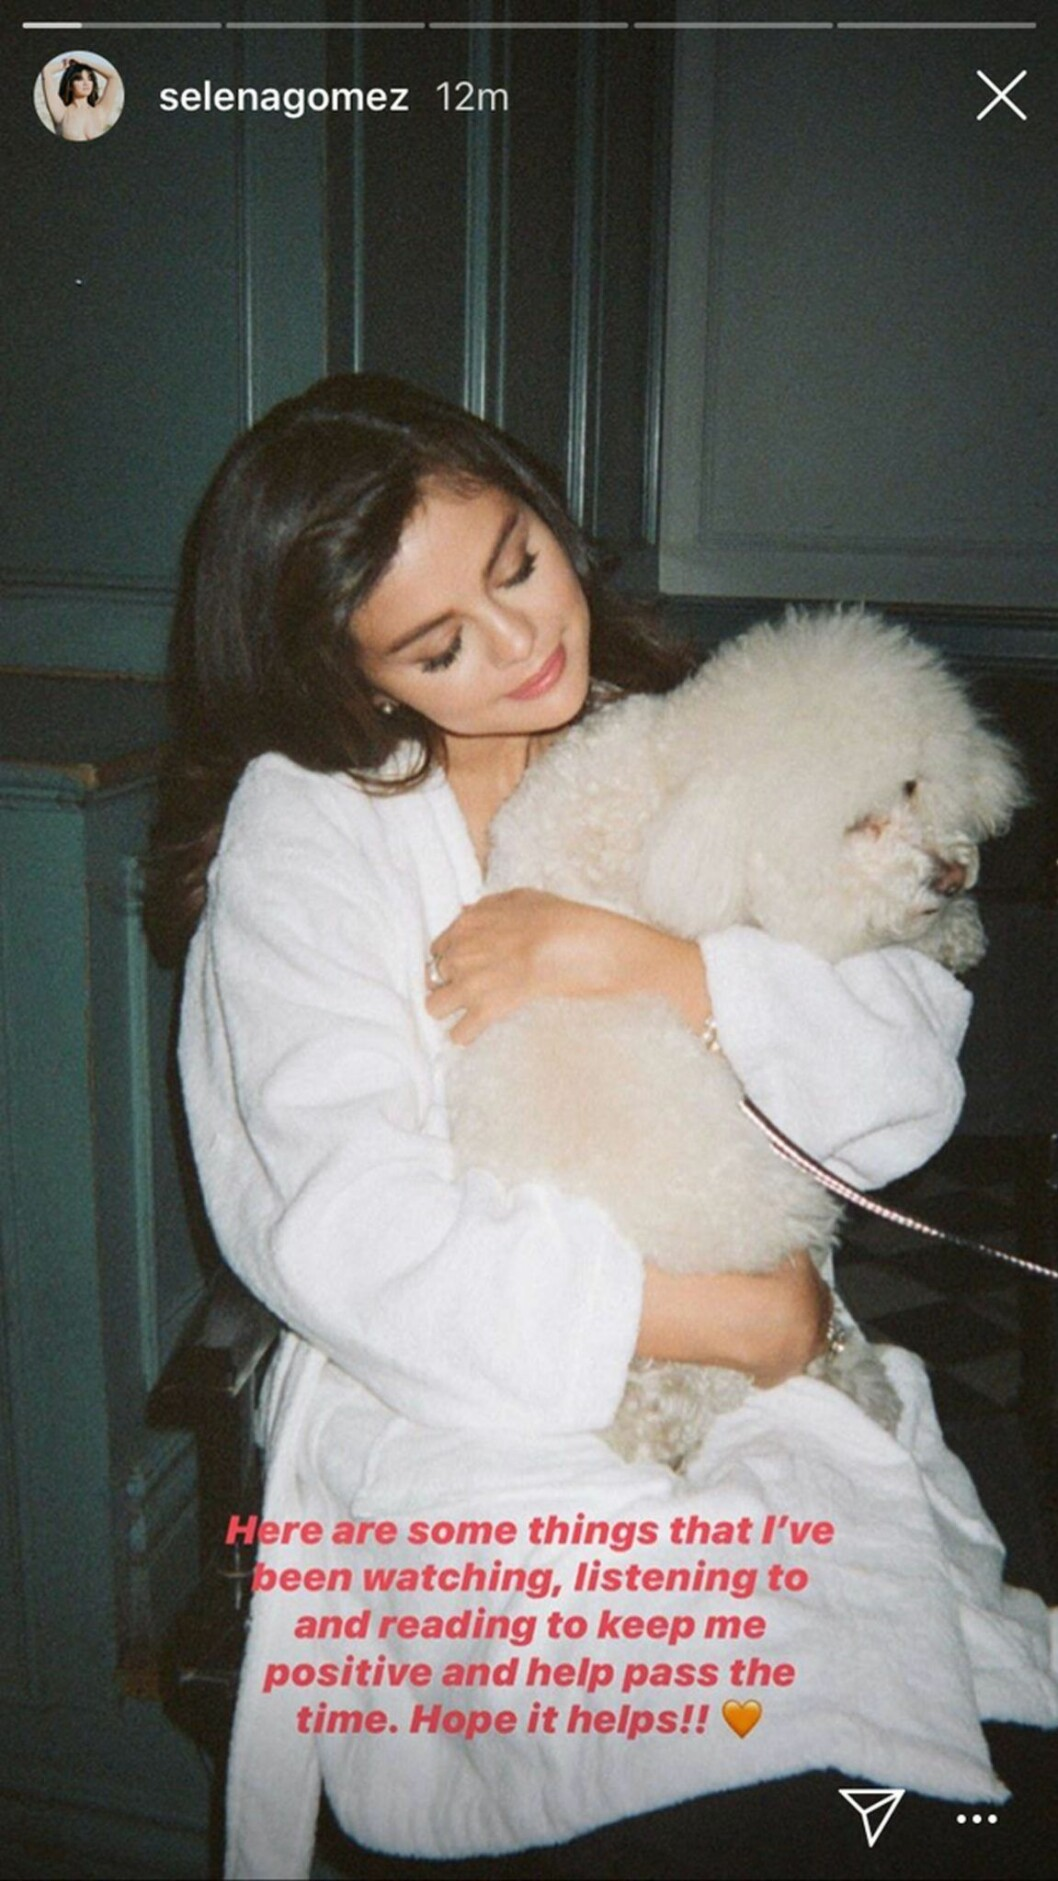 Skärmdump från Selena Gomez Instagram